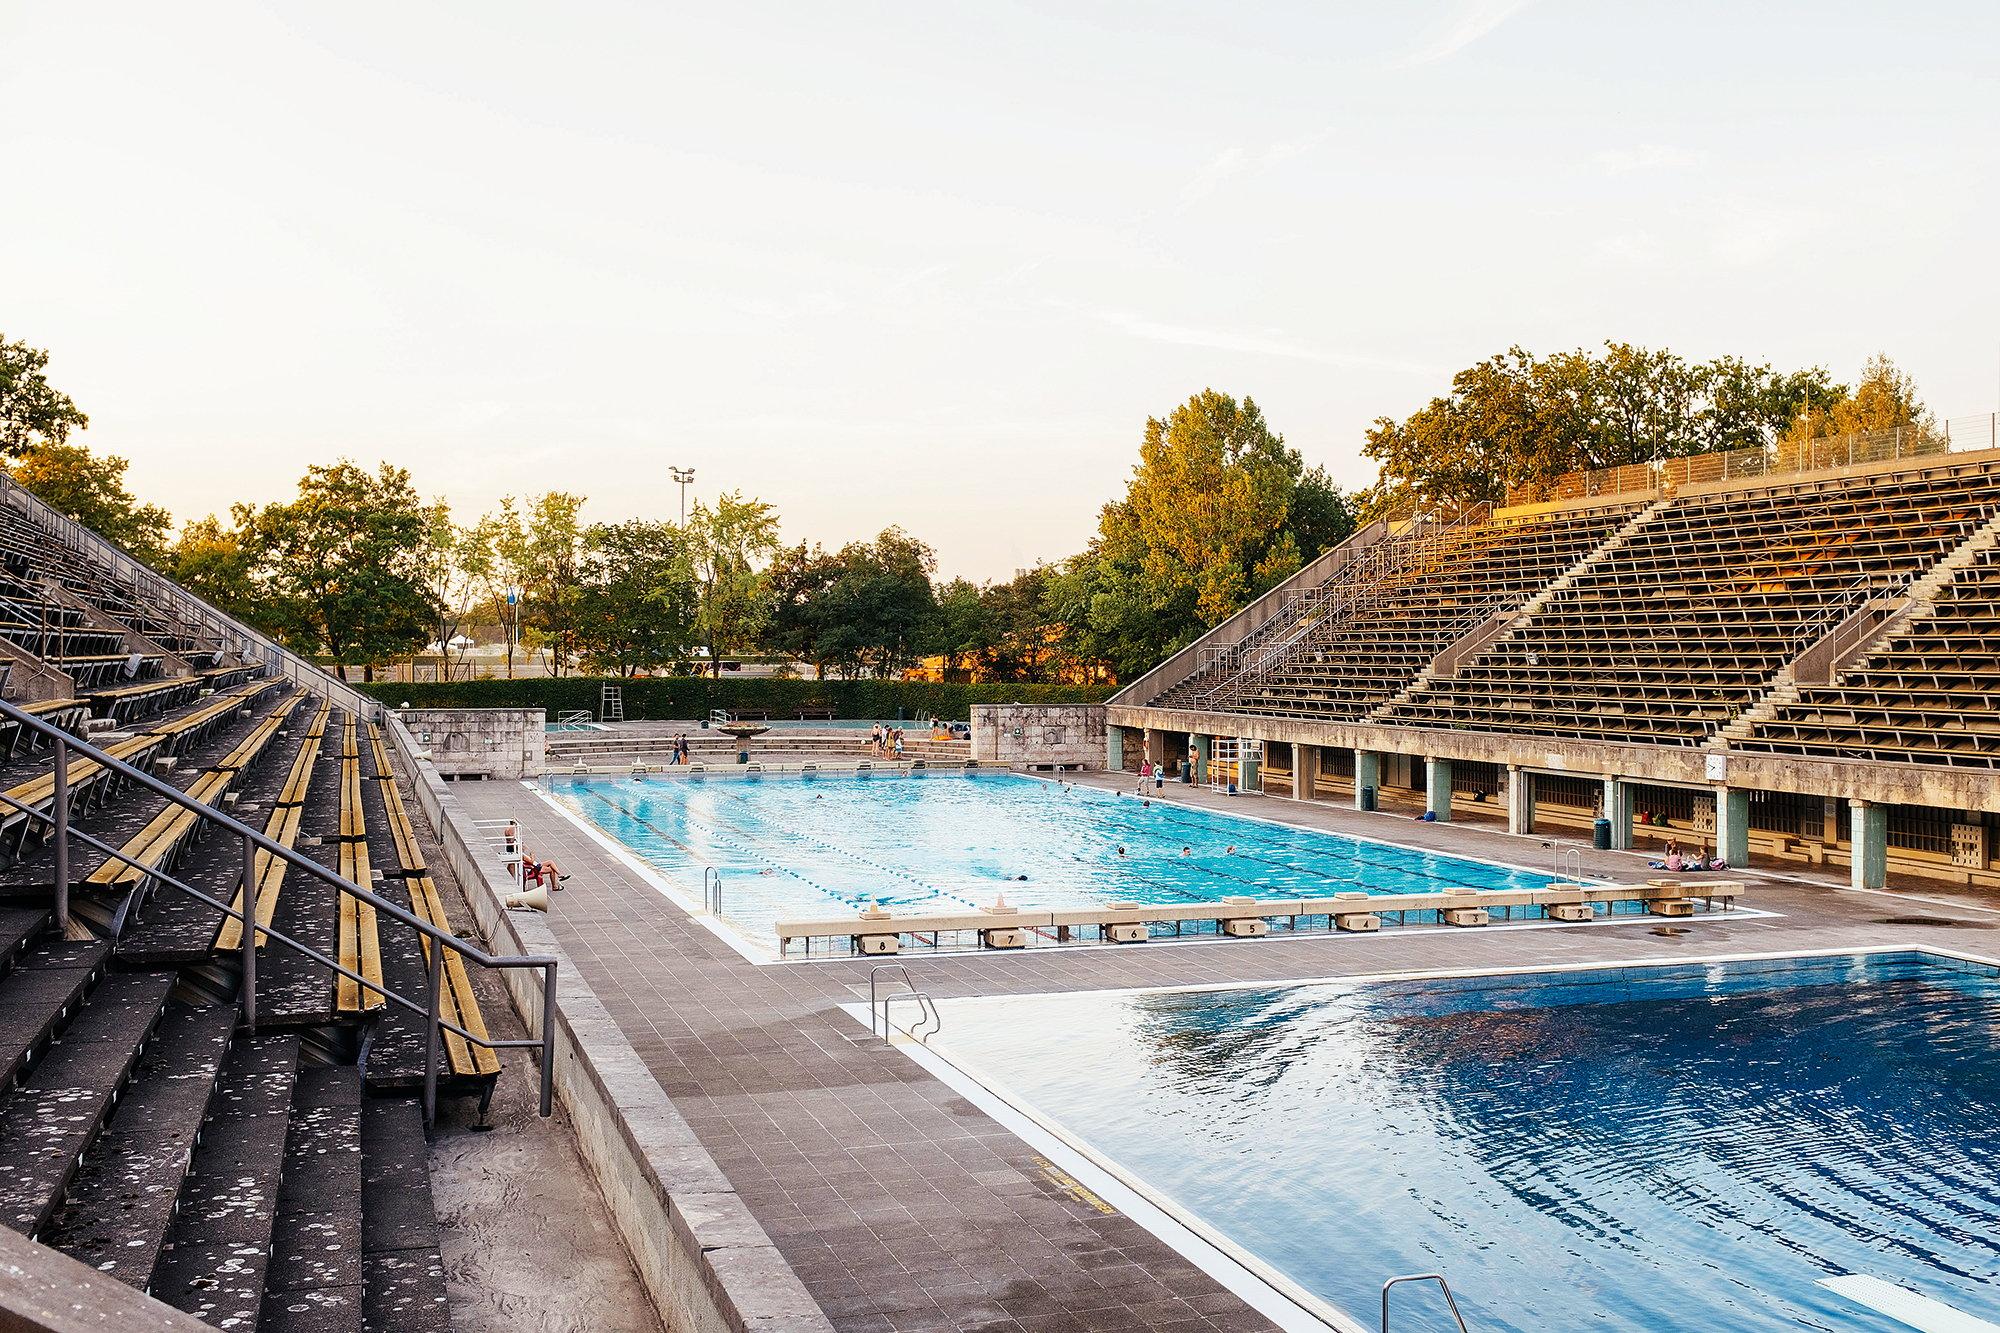 OLYMPIA SCHWIMMSTADION, Berlin, Foto: Alexander Rentsch